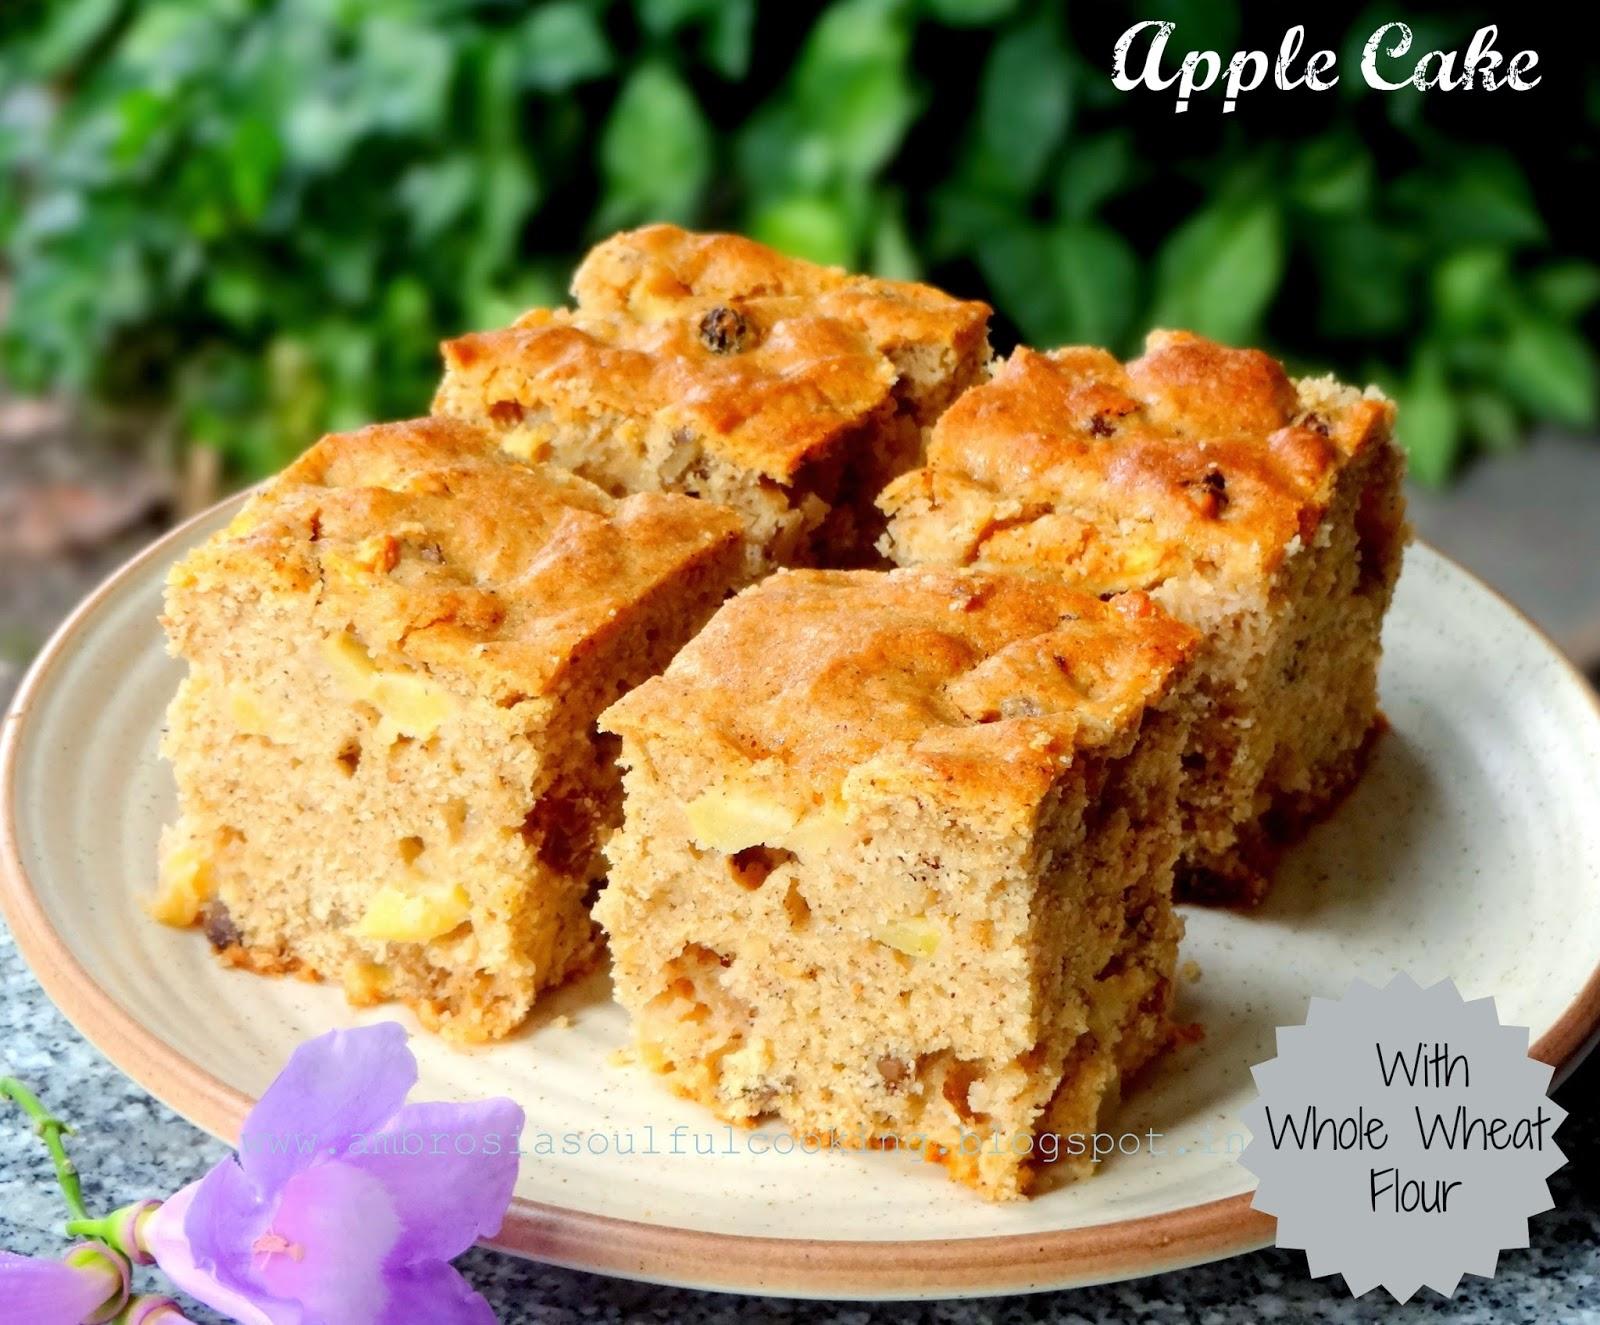 AMBROSIA: Apple Cake (With Whole Wheat flour)